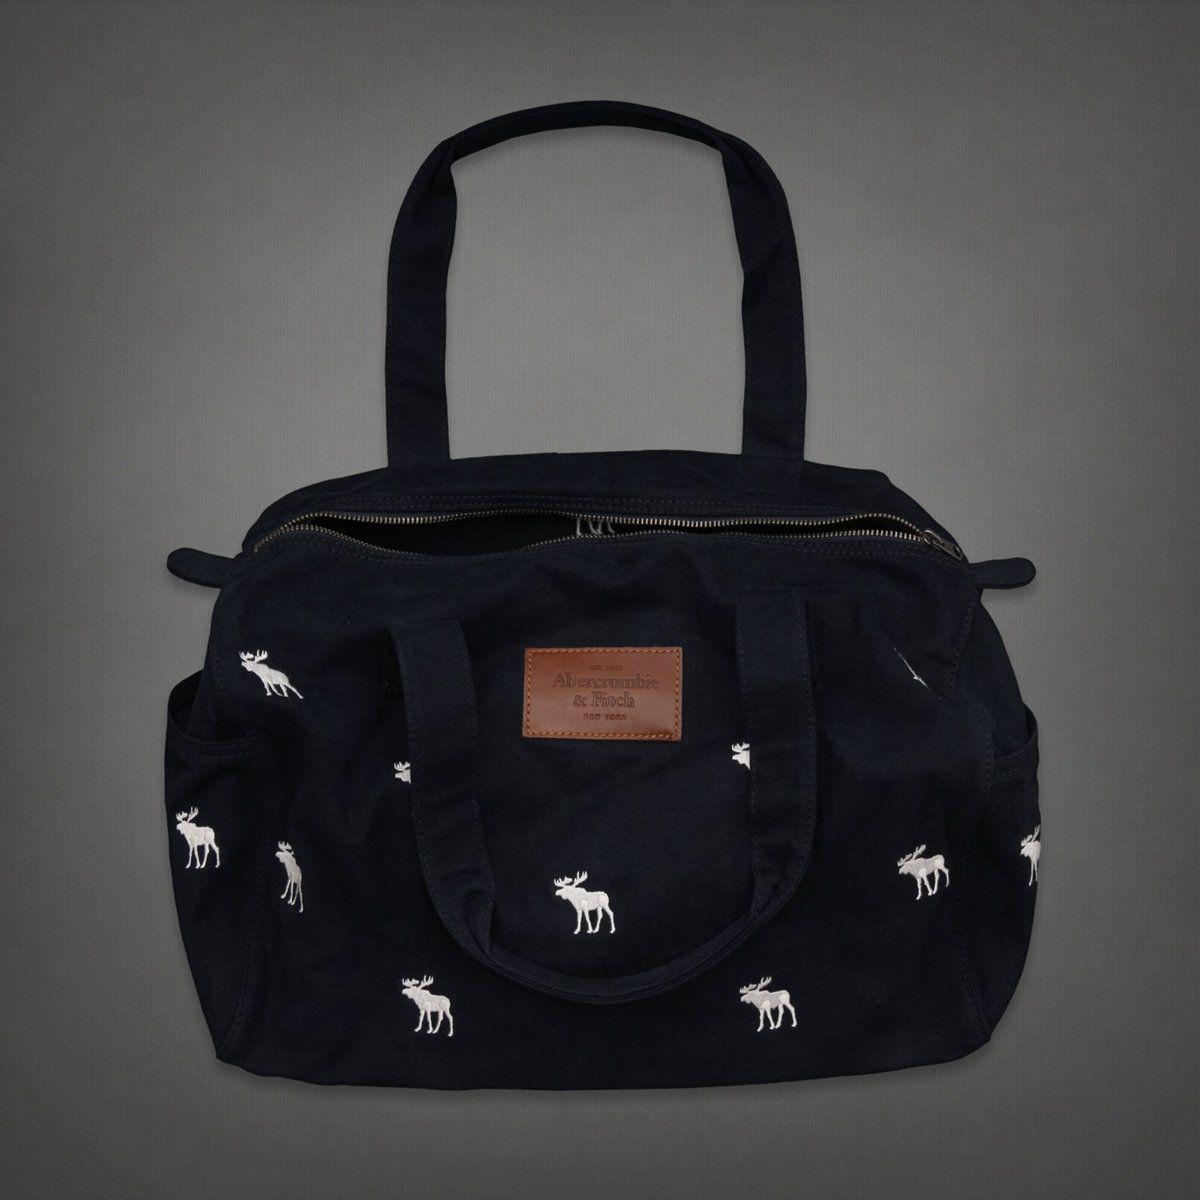 abercrombie bag handbags